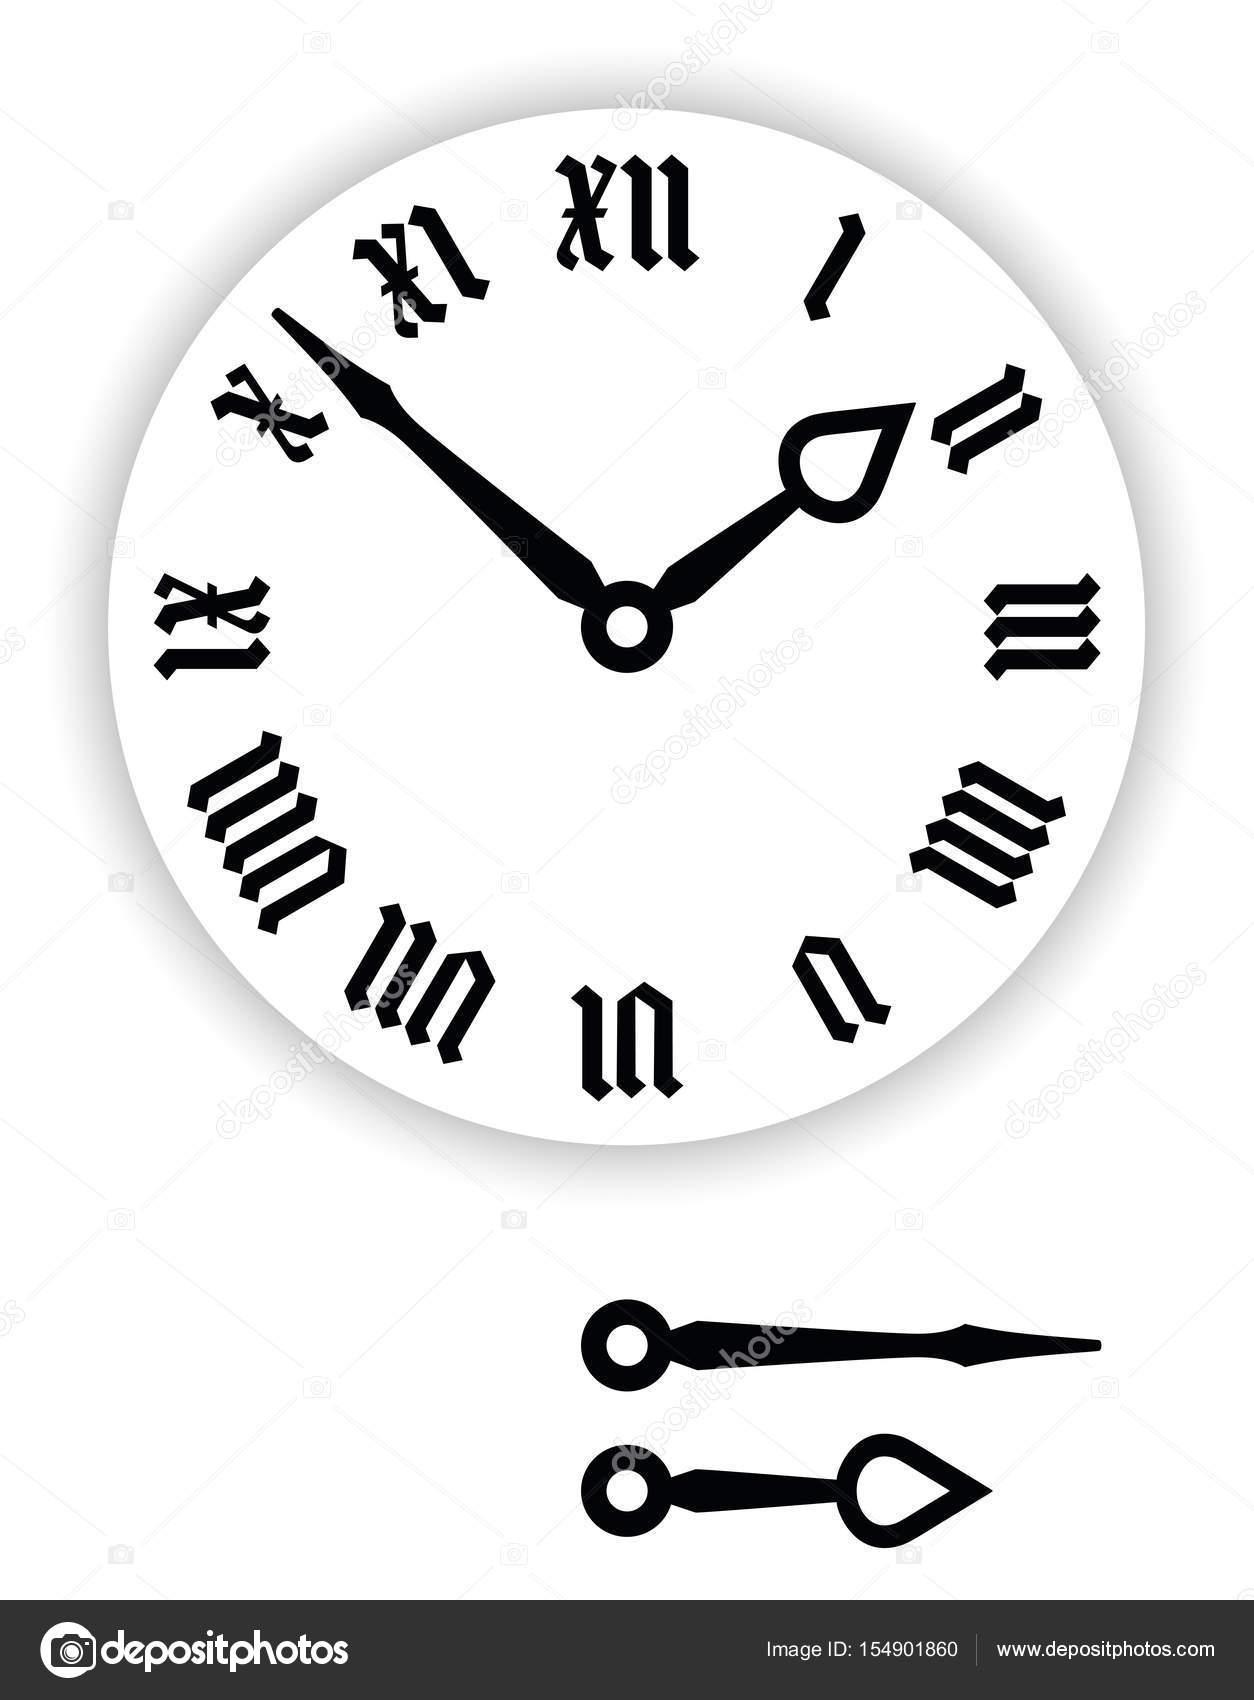 fraktur roman numerals clock face stock vector furian 154901860